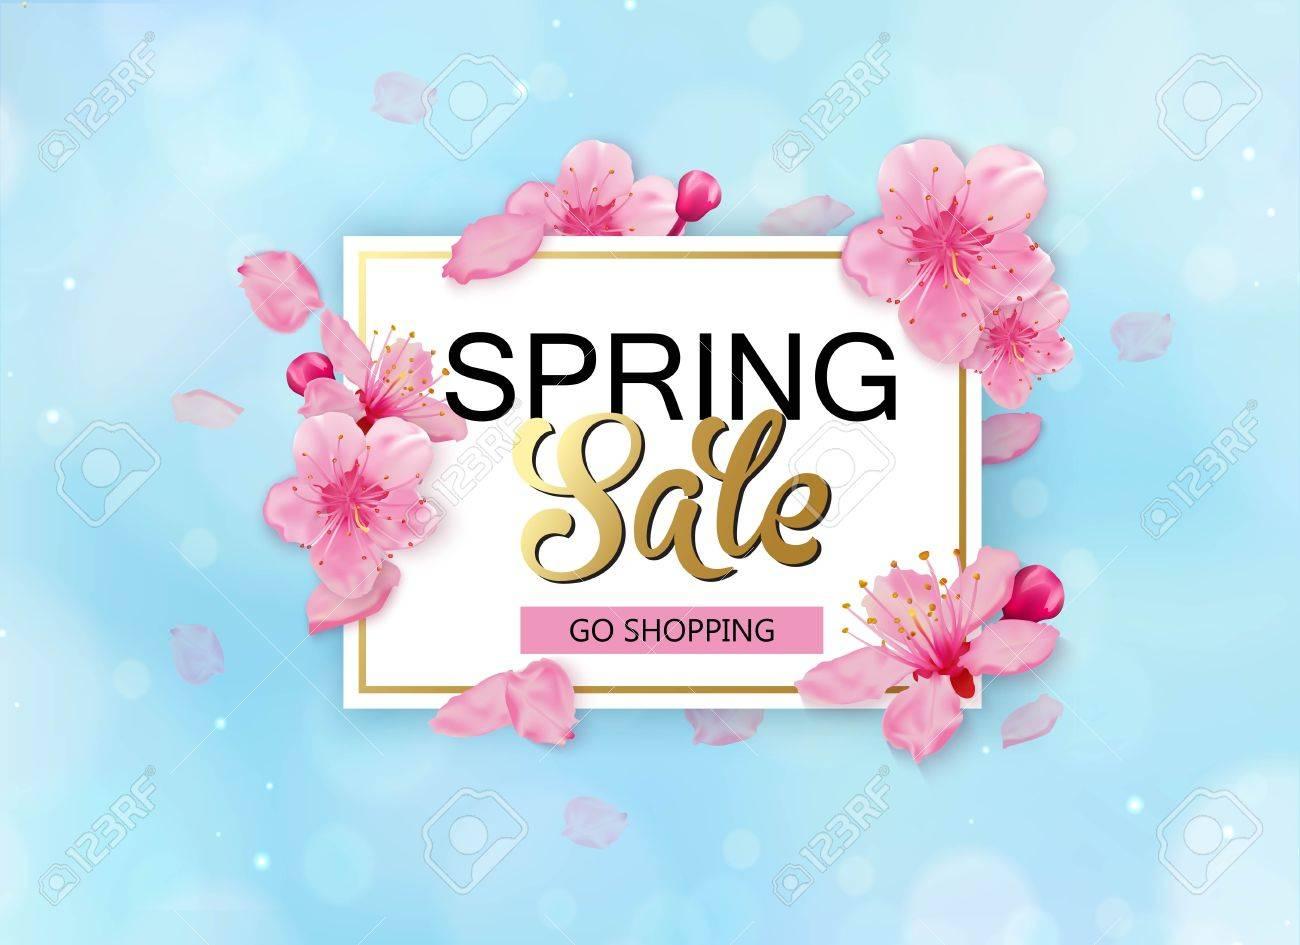 Spring sale with flowers season discount banner design with cherry spring sale with flowers season discount banner design with cherry blossoms and petals stok izmirmasajfo